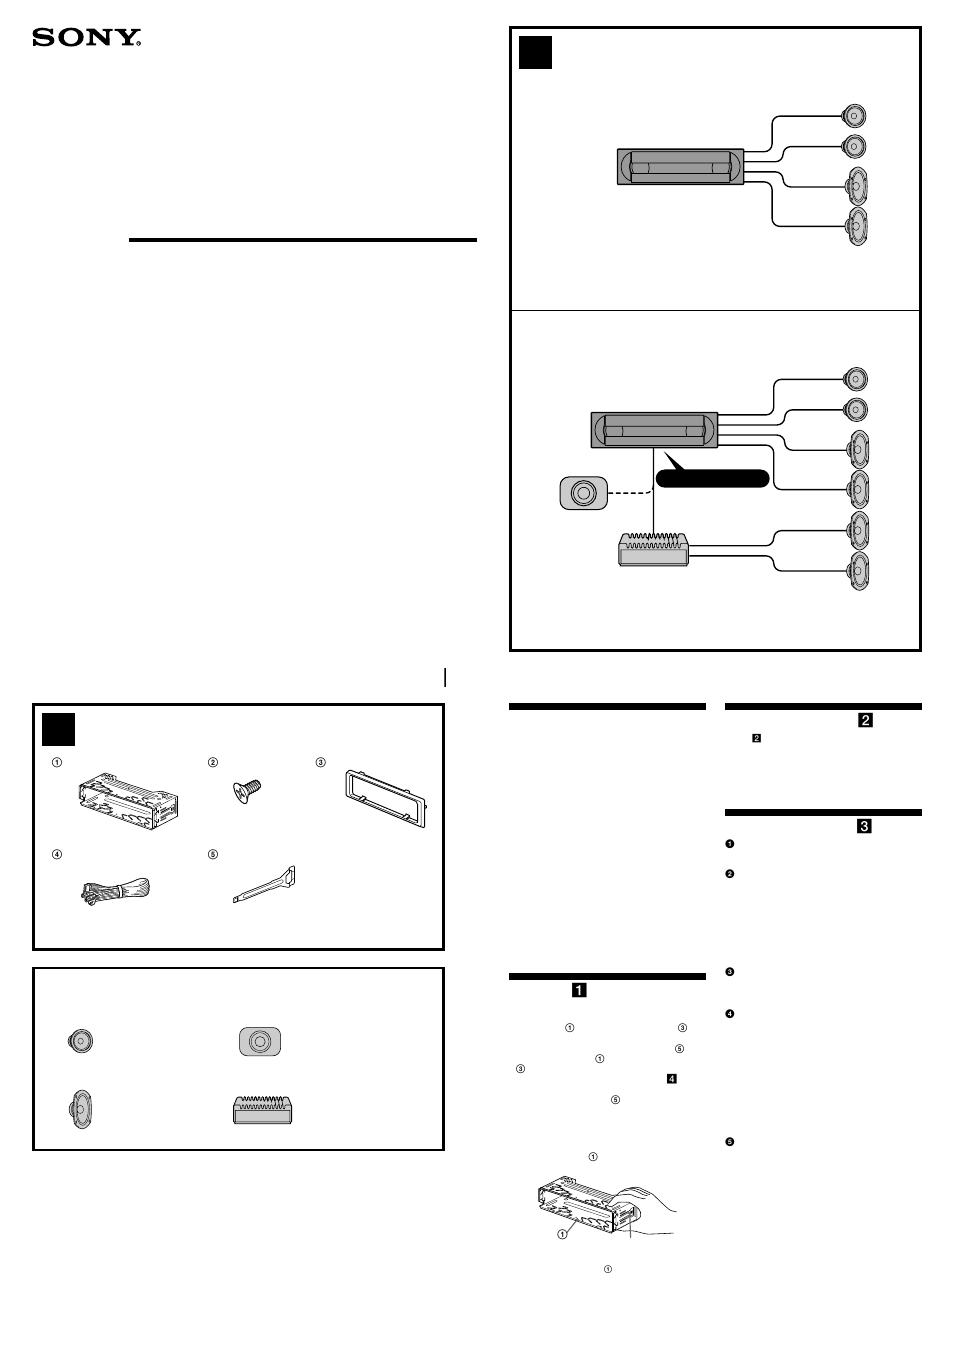 hight resolution of sony cdx r3000 car radio wiring diagram wiring library sony cdx r3000 car radio wiring diagram